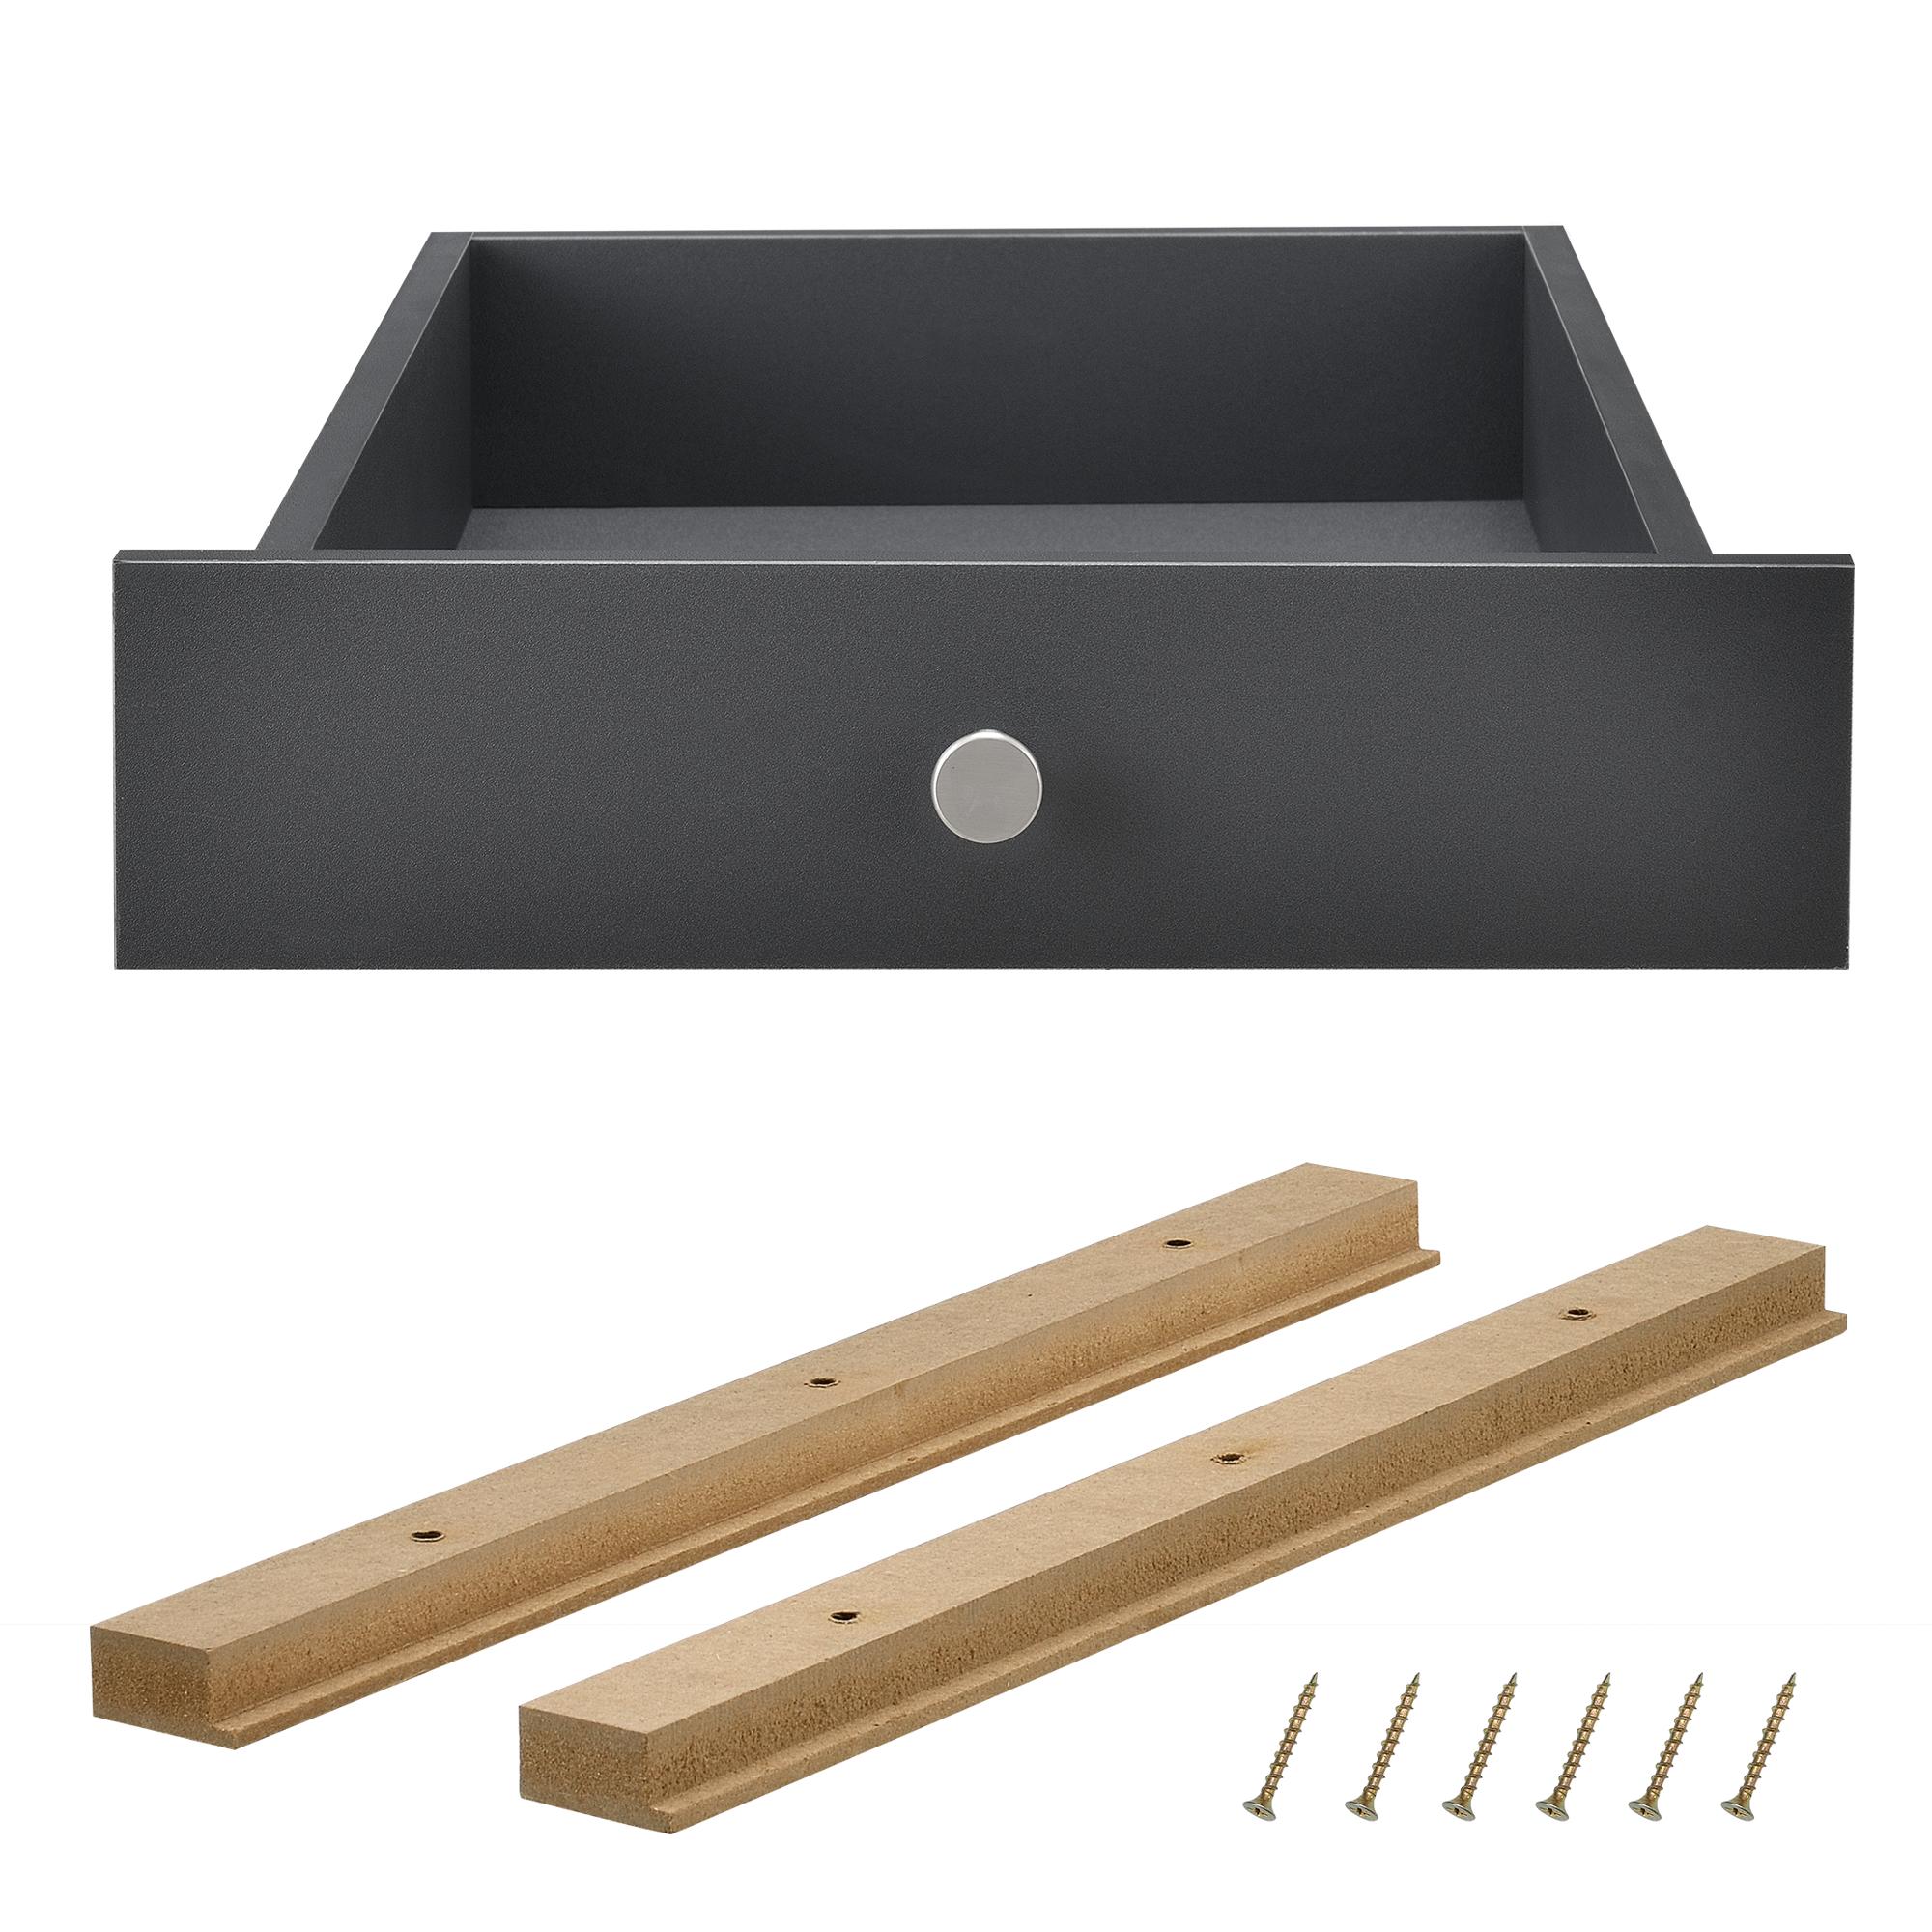 4x schublade f r europaletten regal kommode. Black Bedroom Furniture Sets. Home Design Ideas